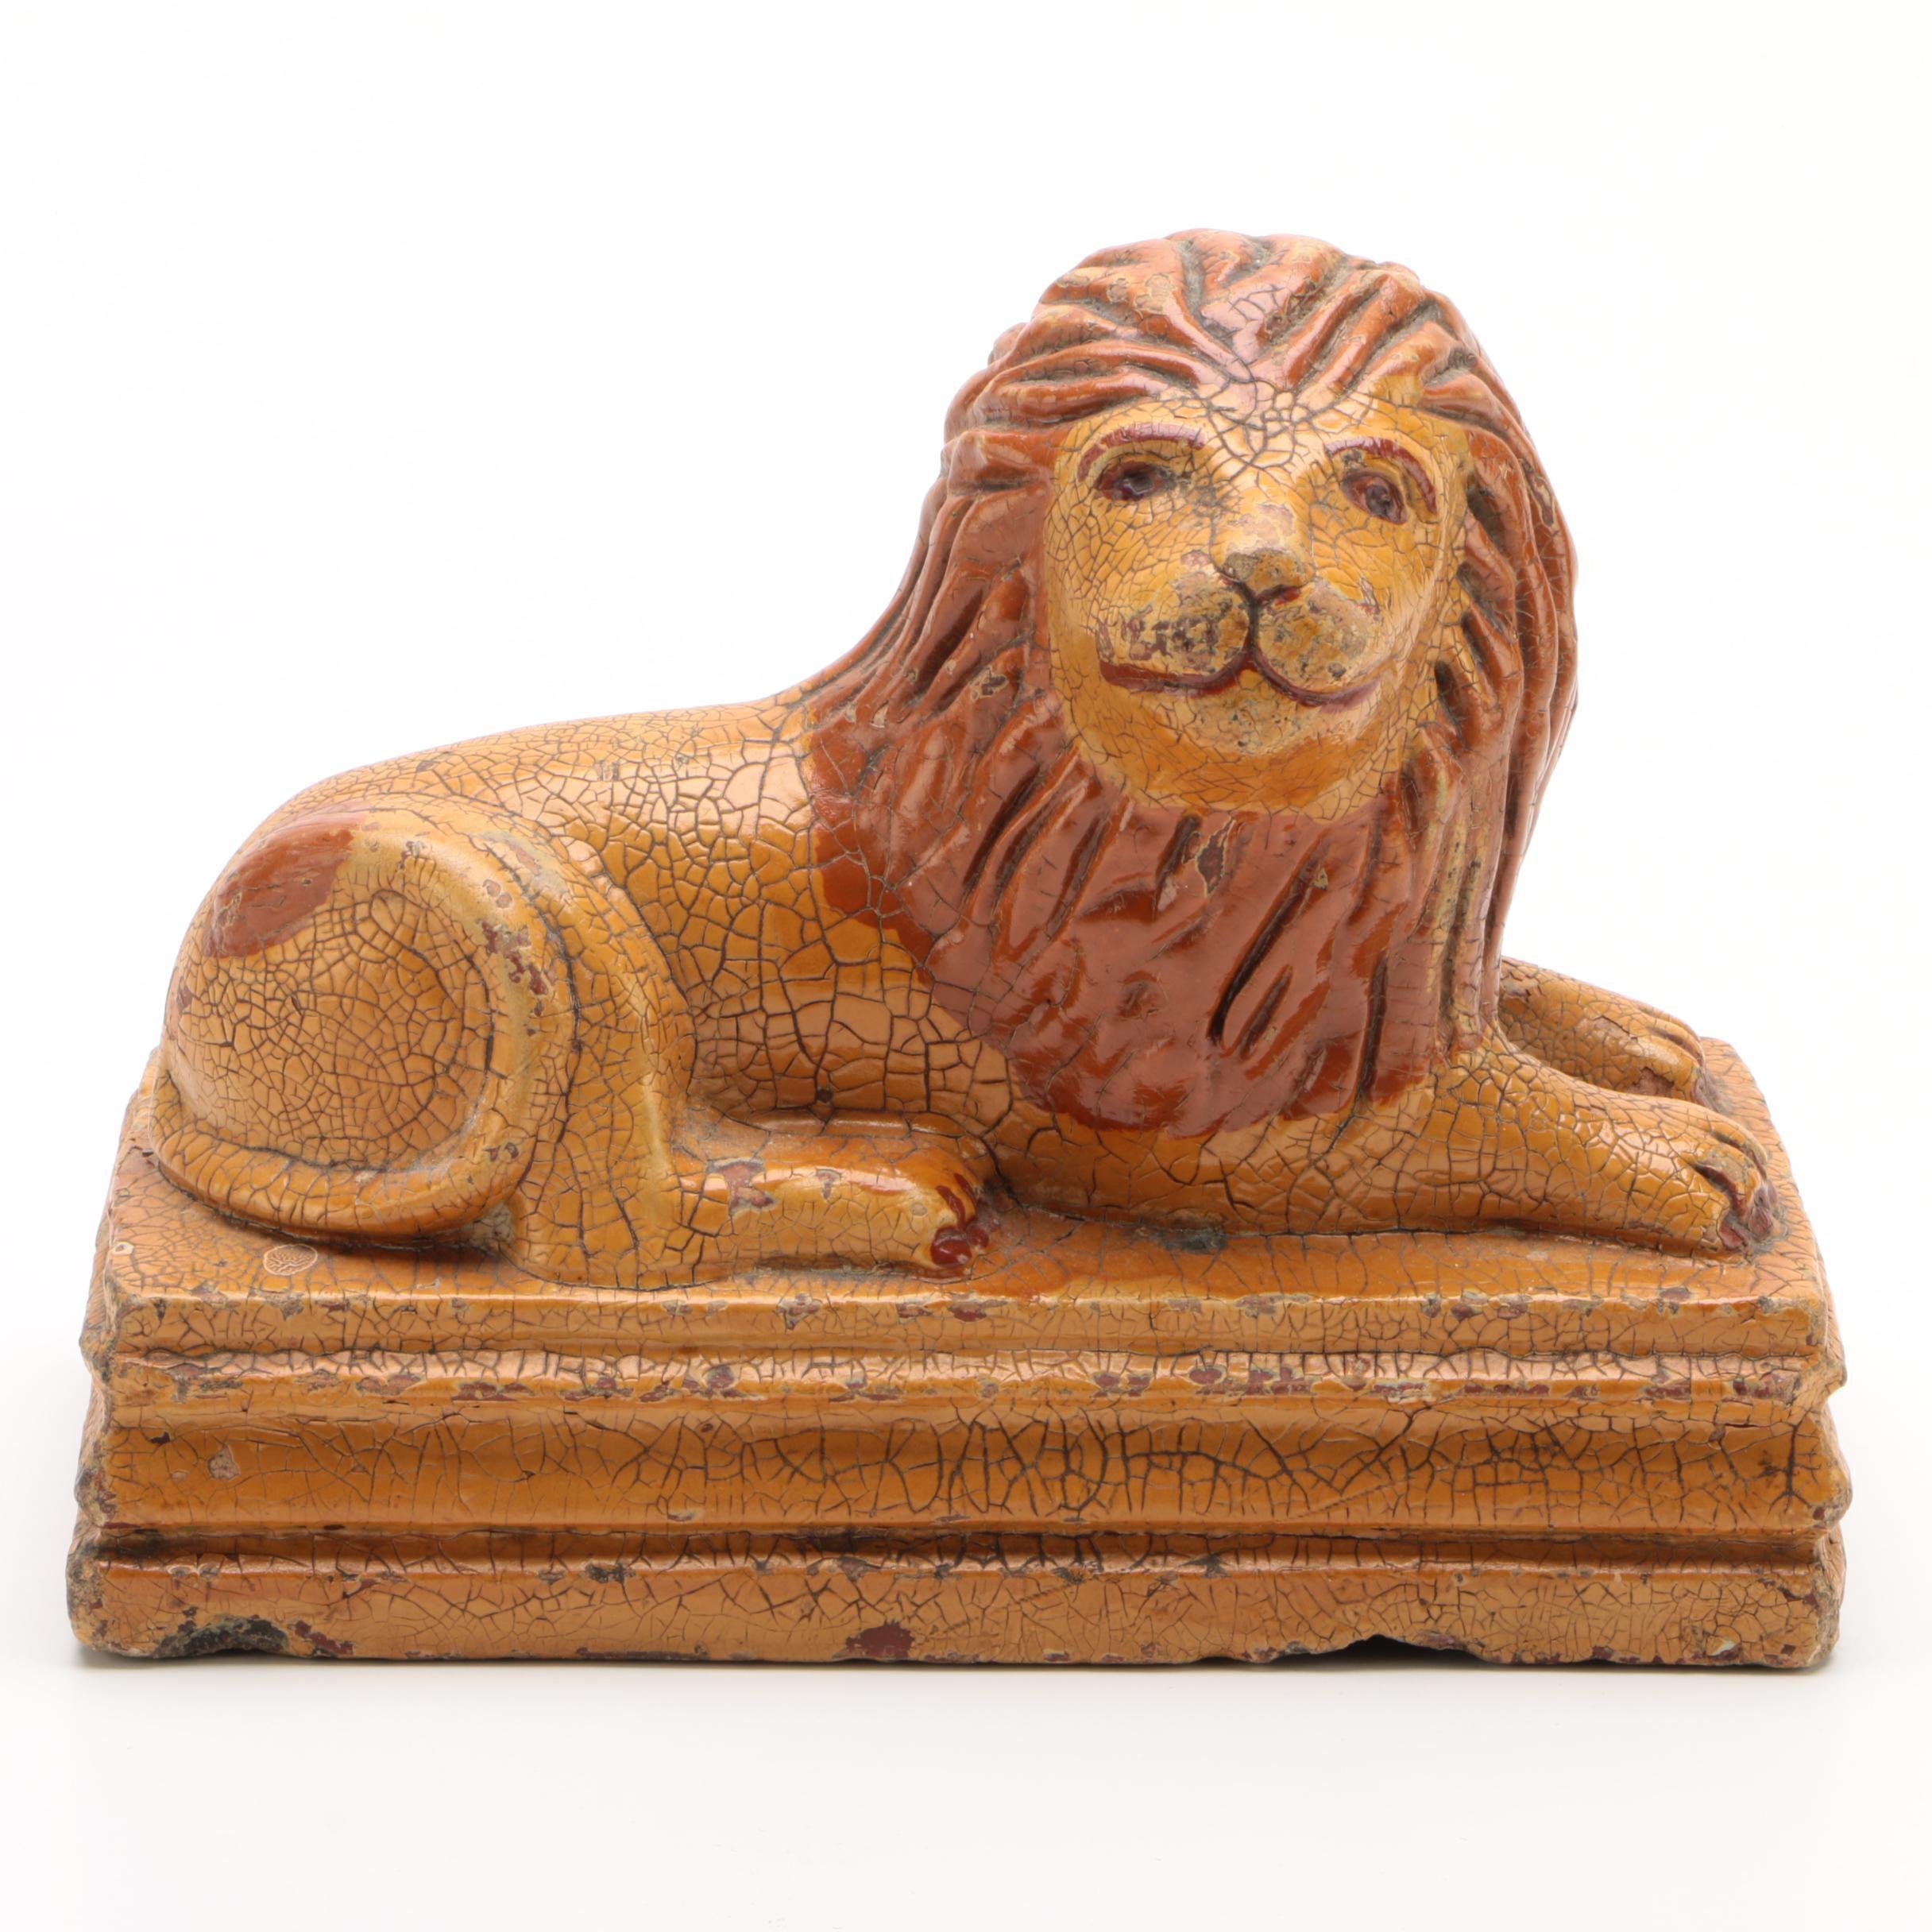 American Folk Art Sewer Tile Recumbent Lion, Early 20th Century